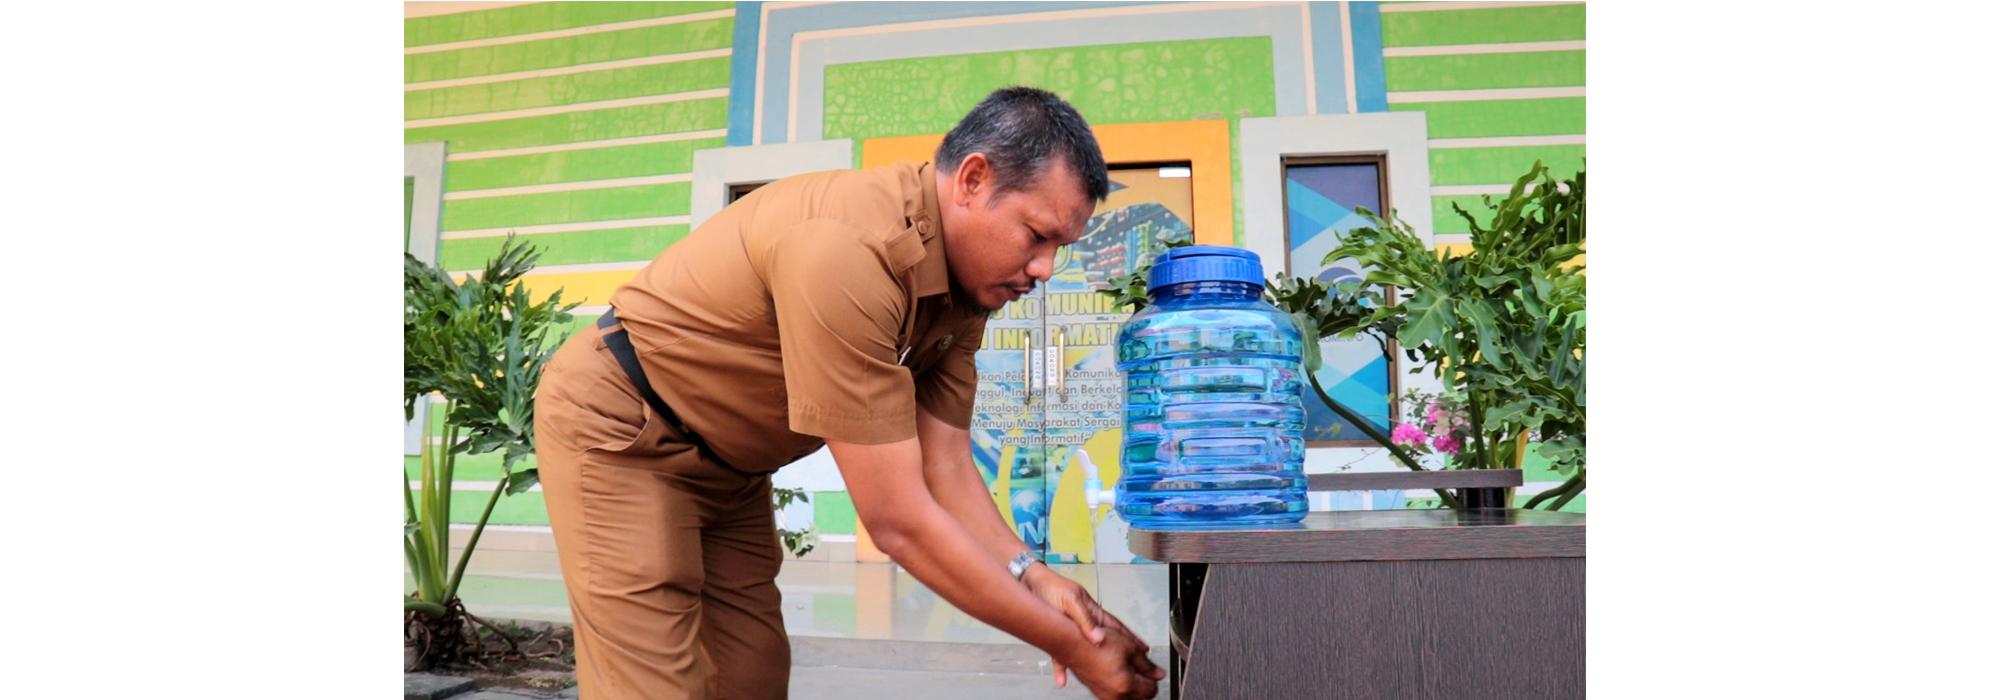 Cegah Corona, Dinas Kominfo Sergai Siapkan Wastafel Cuci Tangan dan Hand Sanitizer